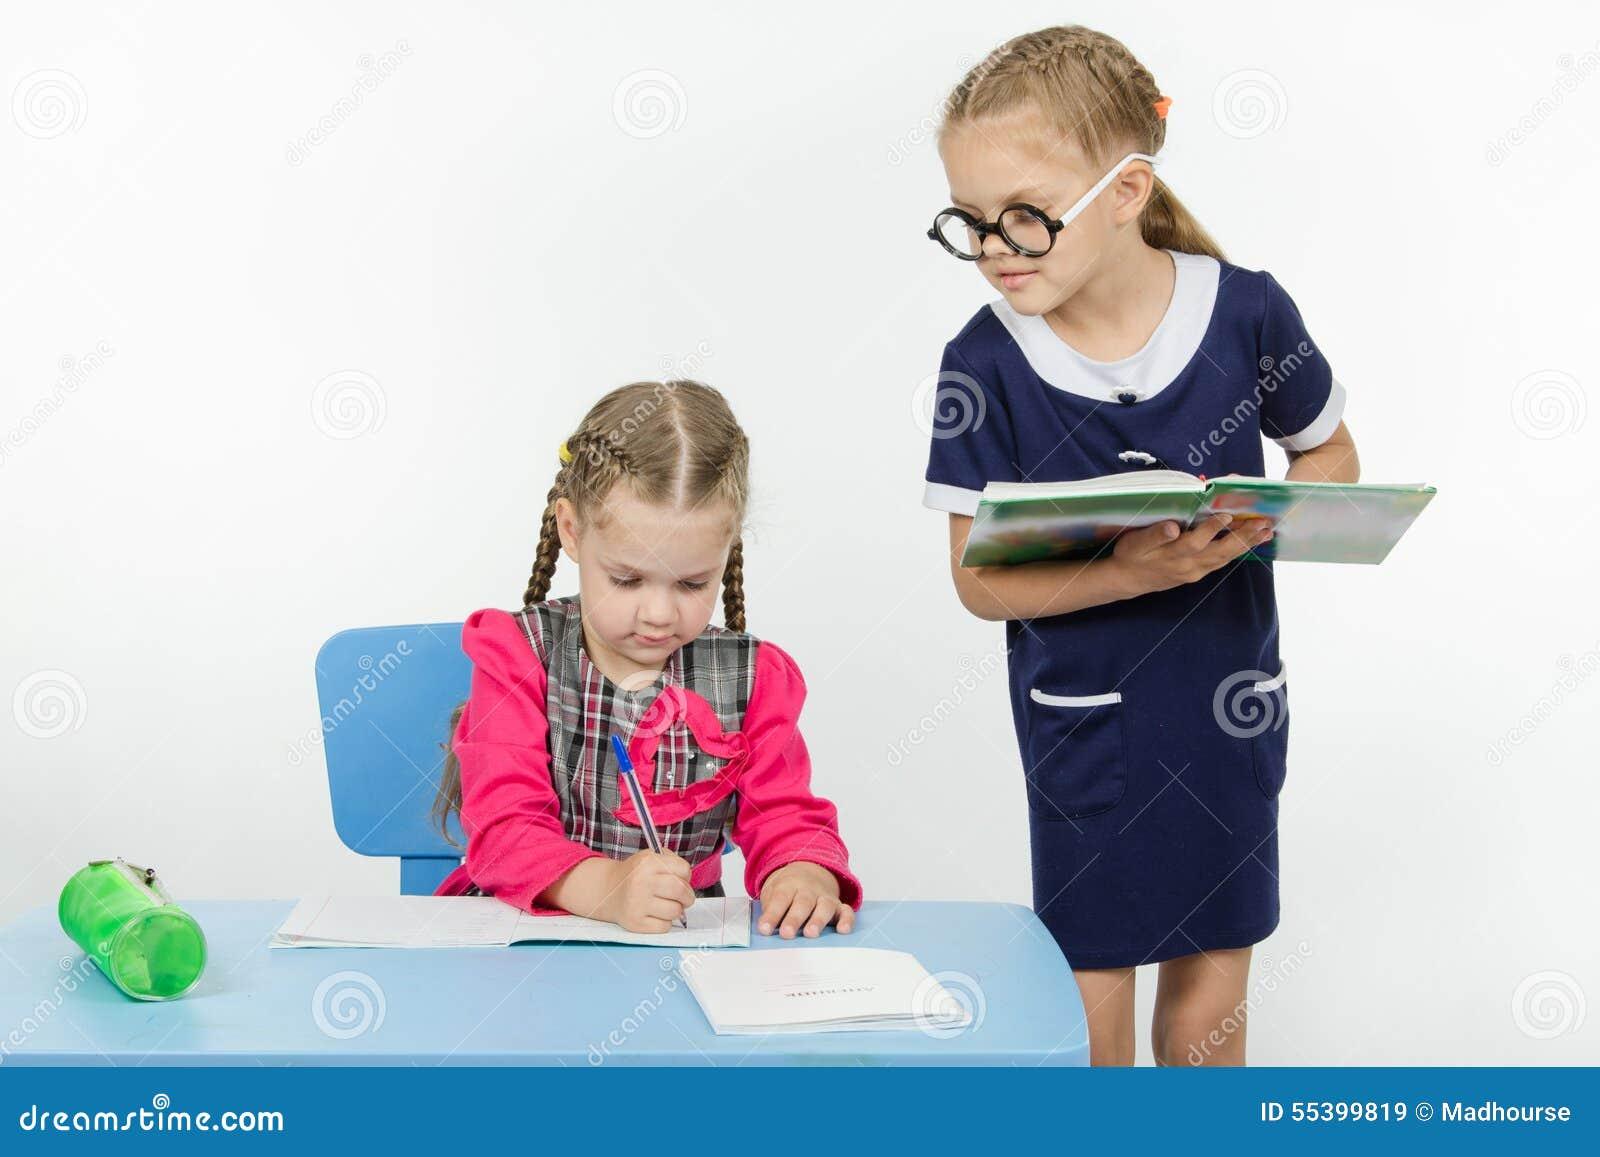 girl student teacher dictating dictation stock photo Thumbs Up Symbol Facebook Thumbs Up Clip Art